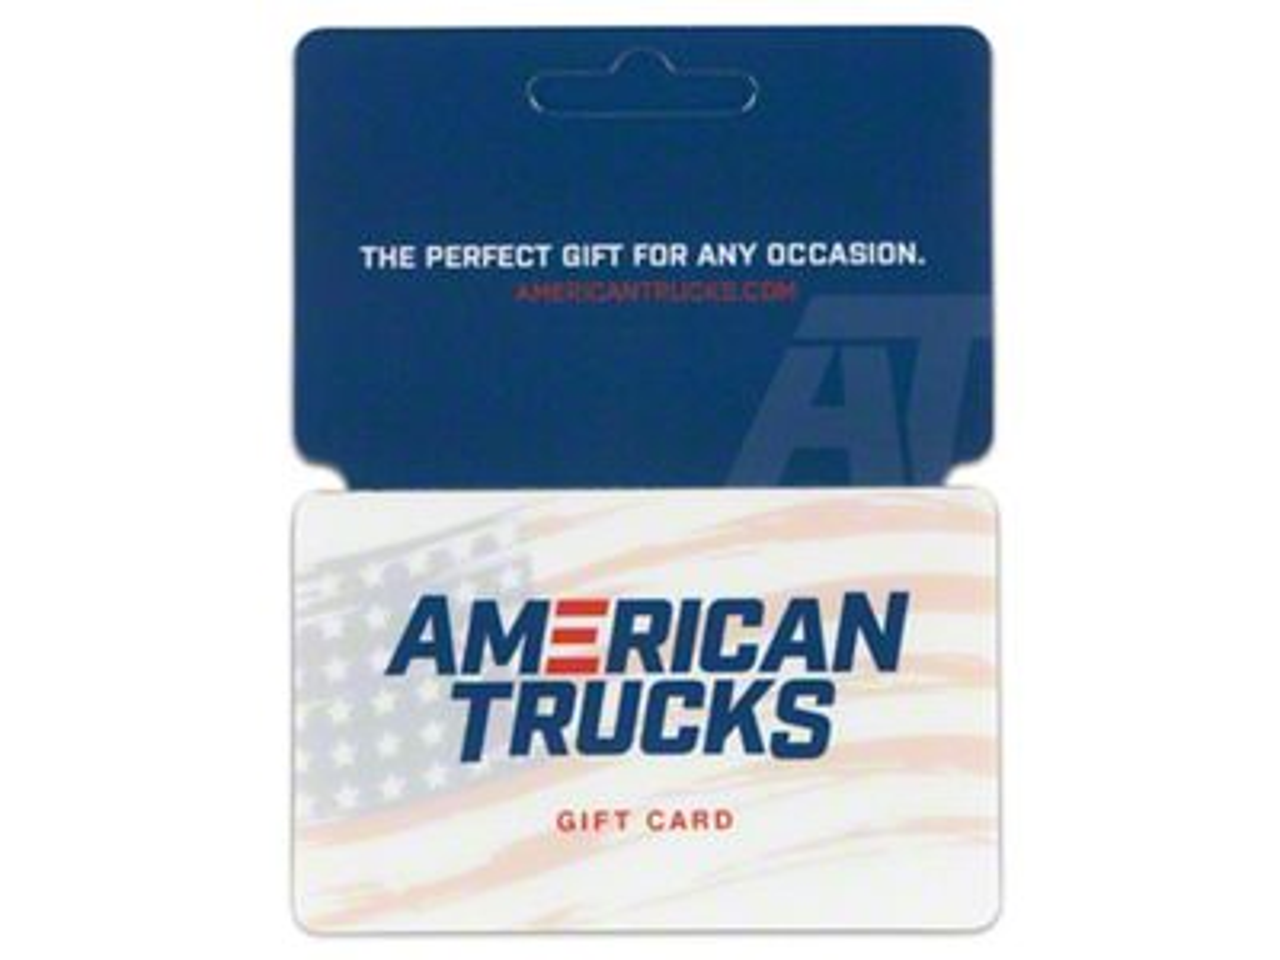 AmericanTrucks Gift Card / Gift Certificate (Mailed)